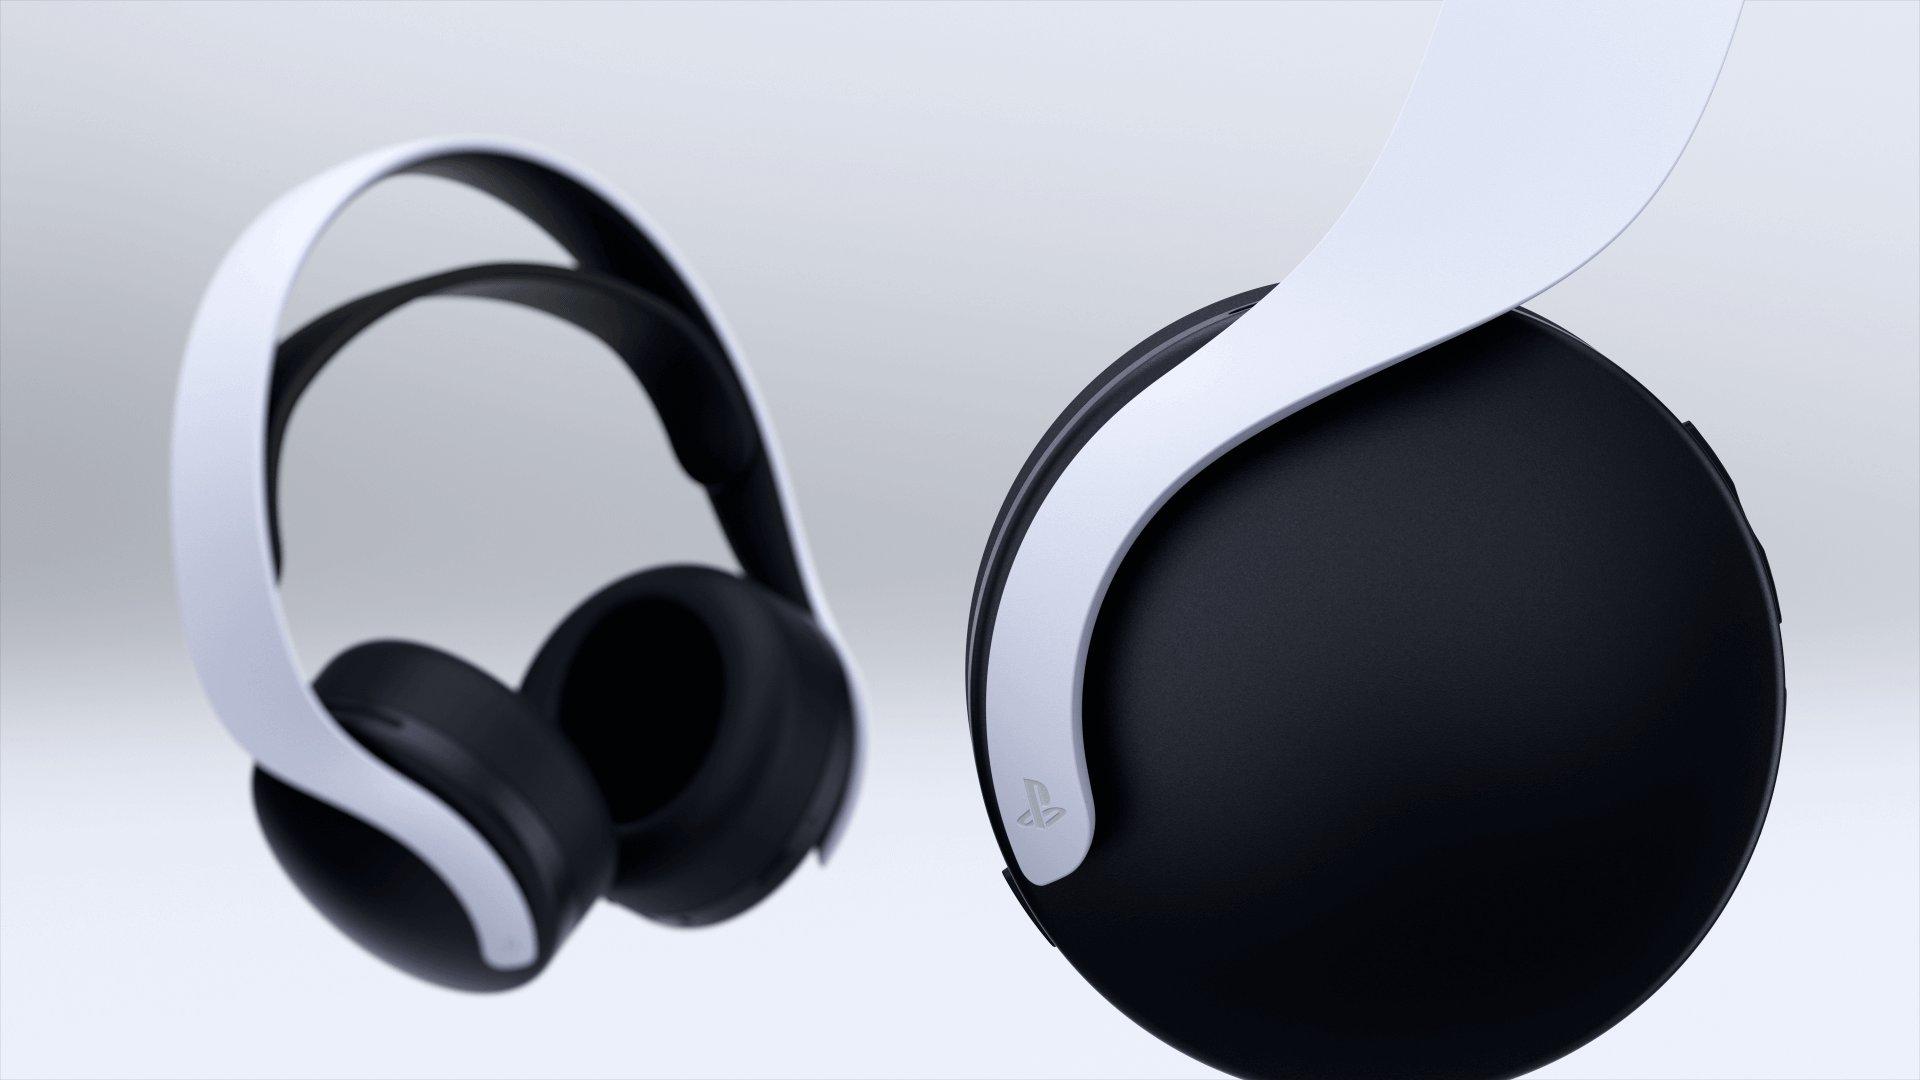 Sony-Pulse-3D-Cultura-Geek-3